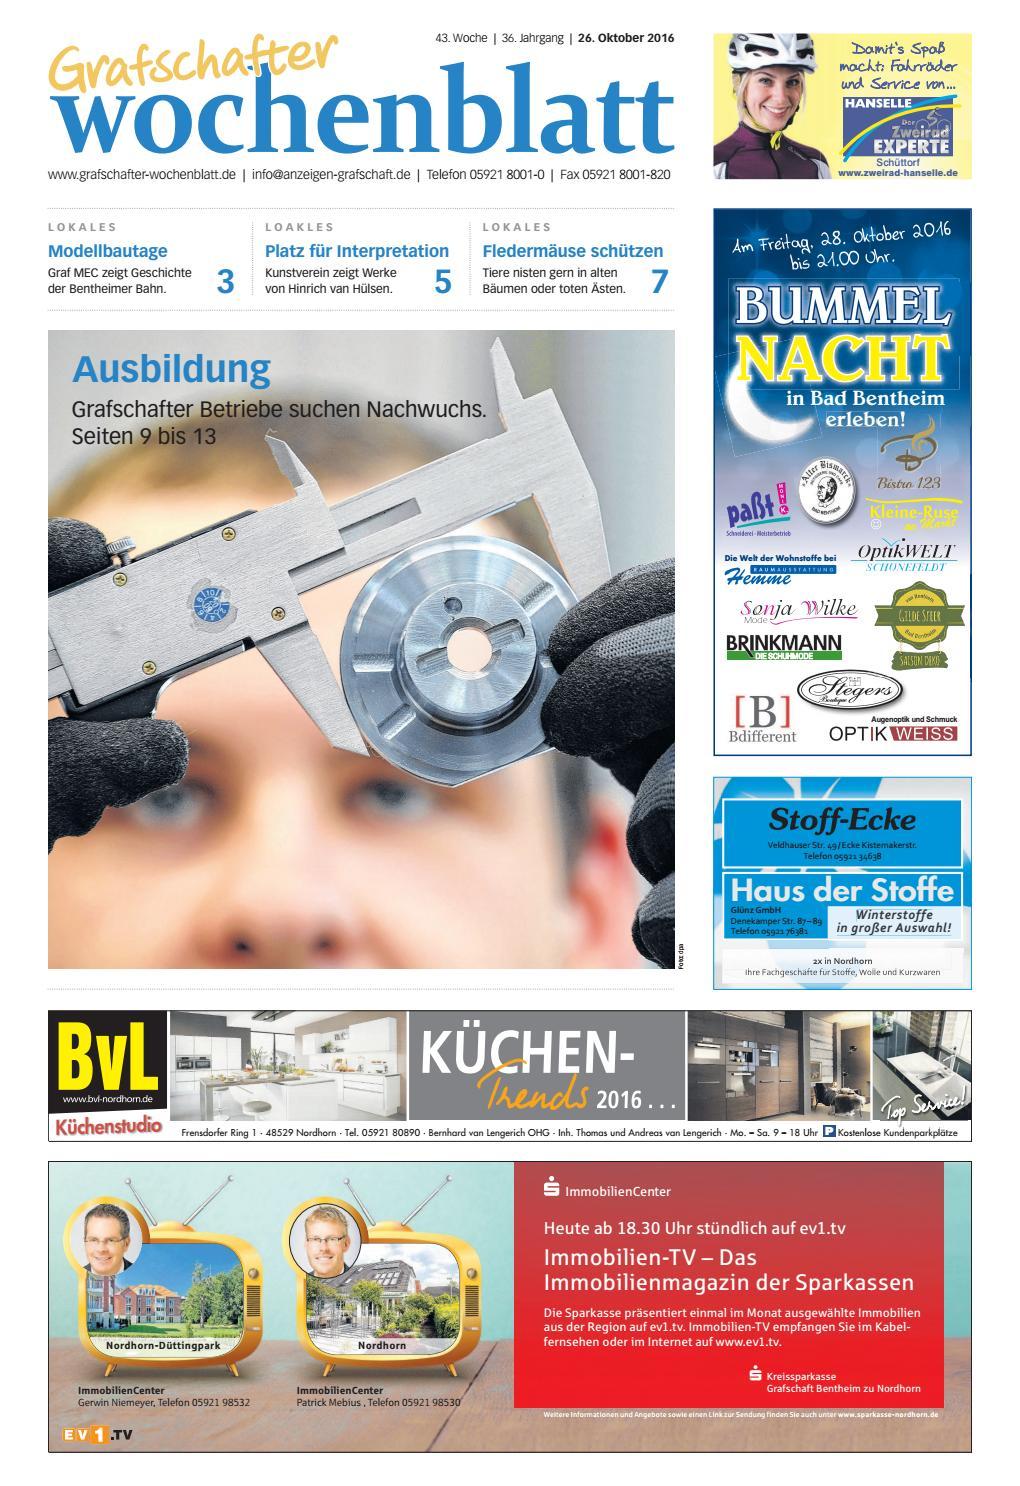 Grafschafter Wochenblatt_26-10-2016 by SonntagsZeitung - issuu